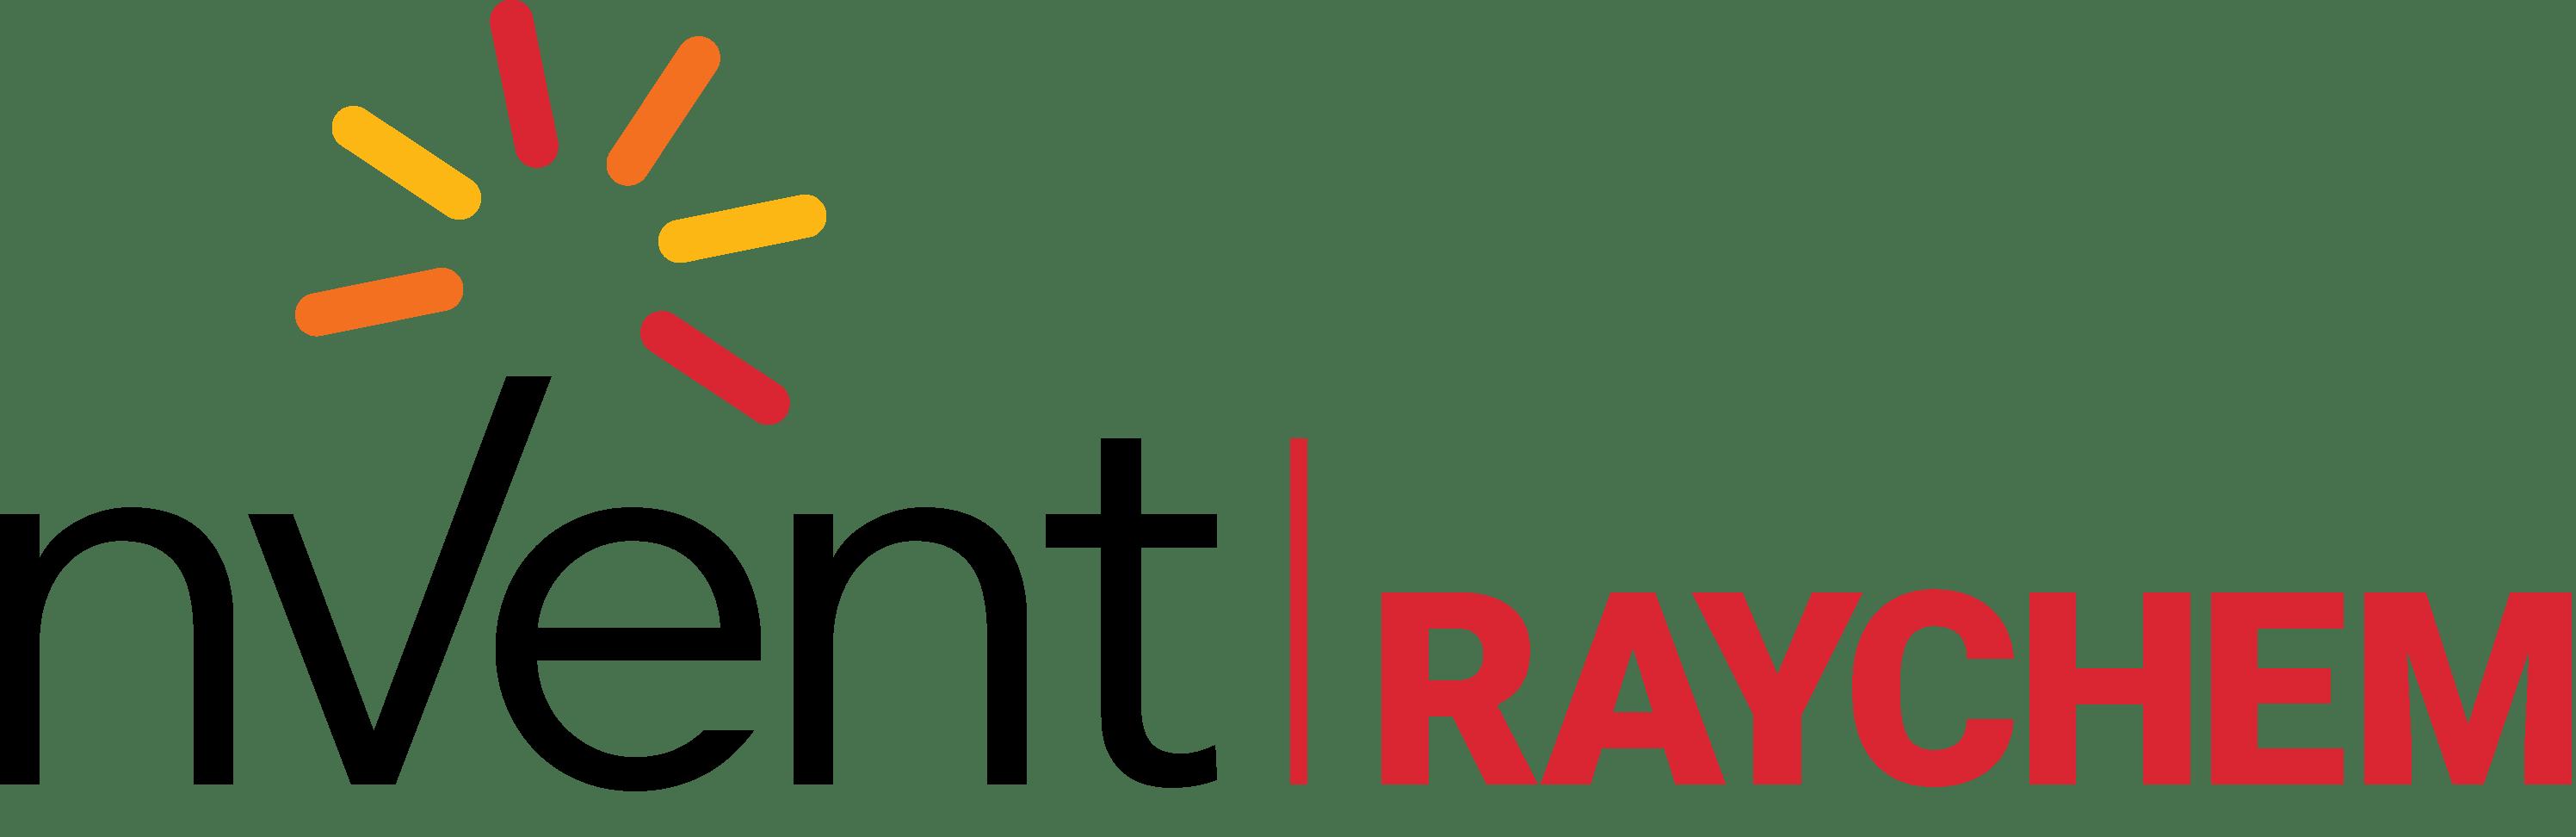 nVent_Raychem_RGB